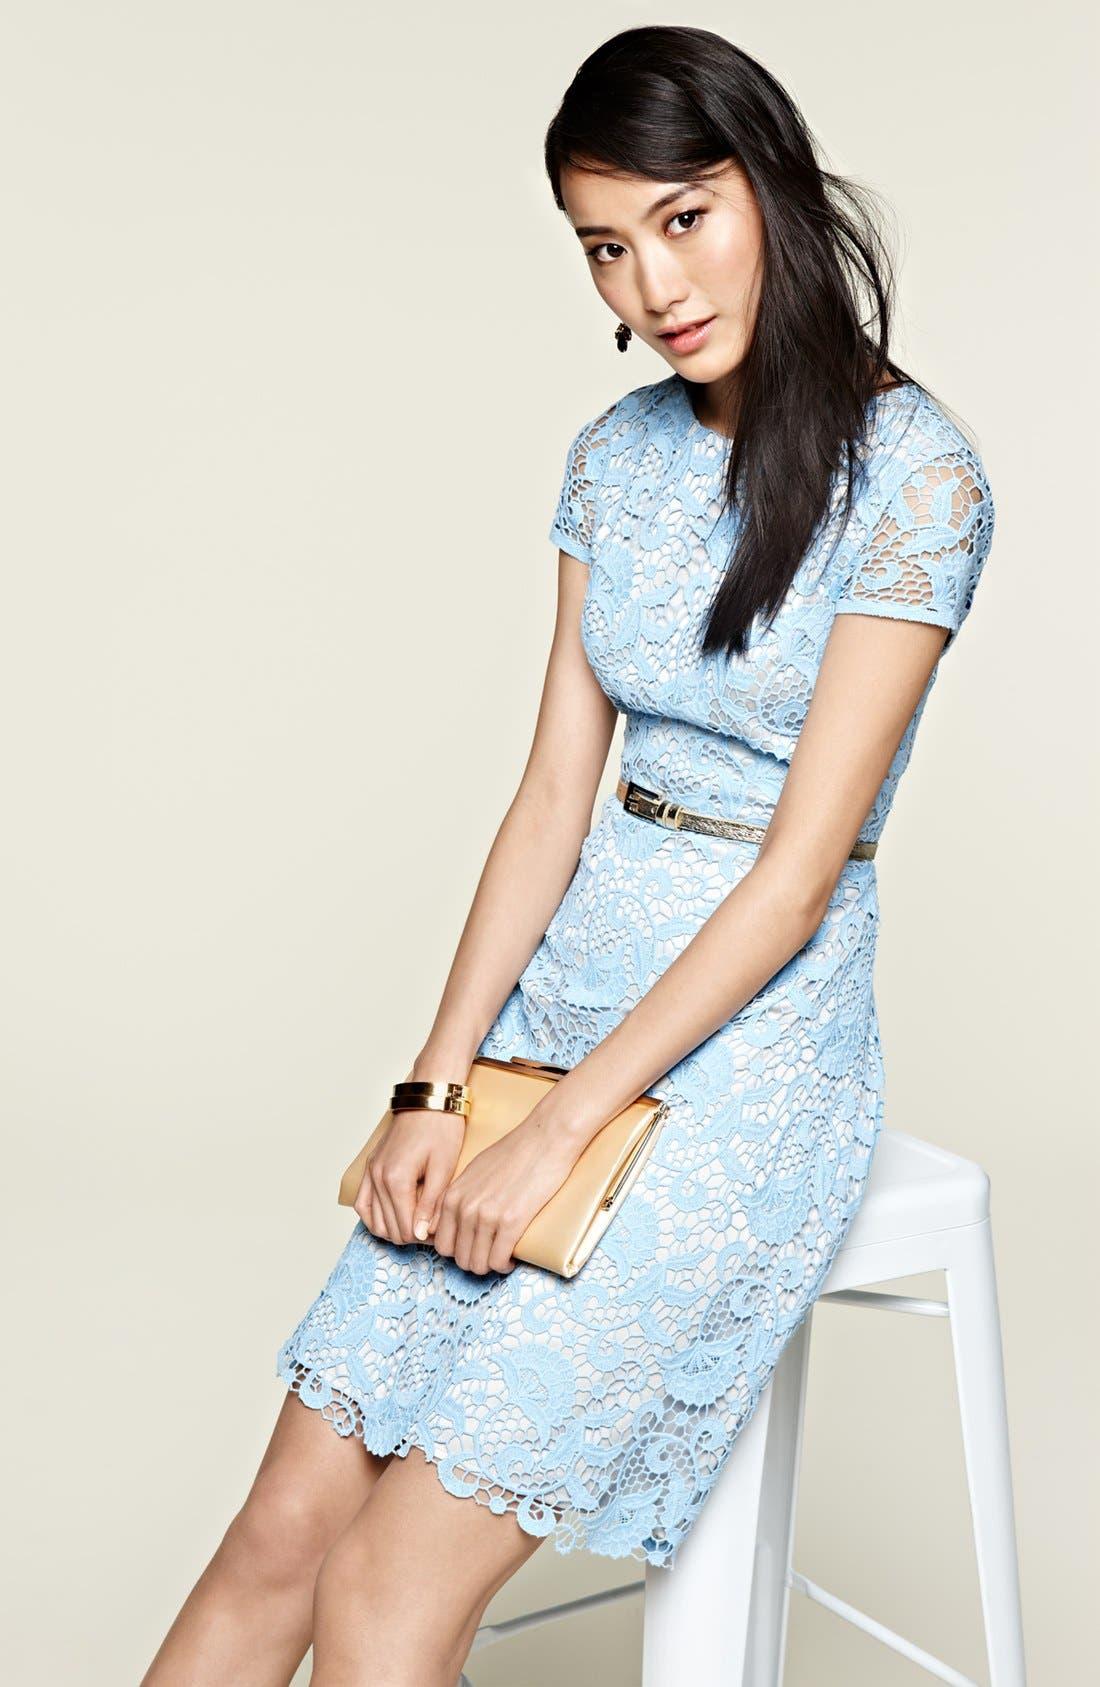 Main Image - Eliza J Lace Dress & Accessories